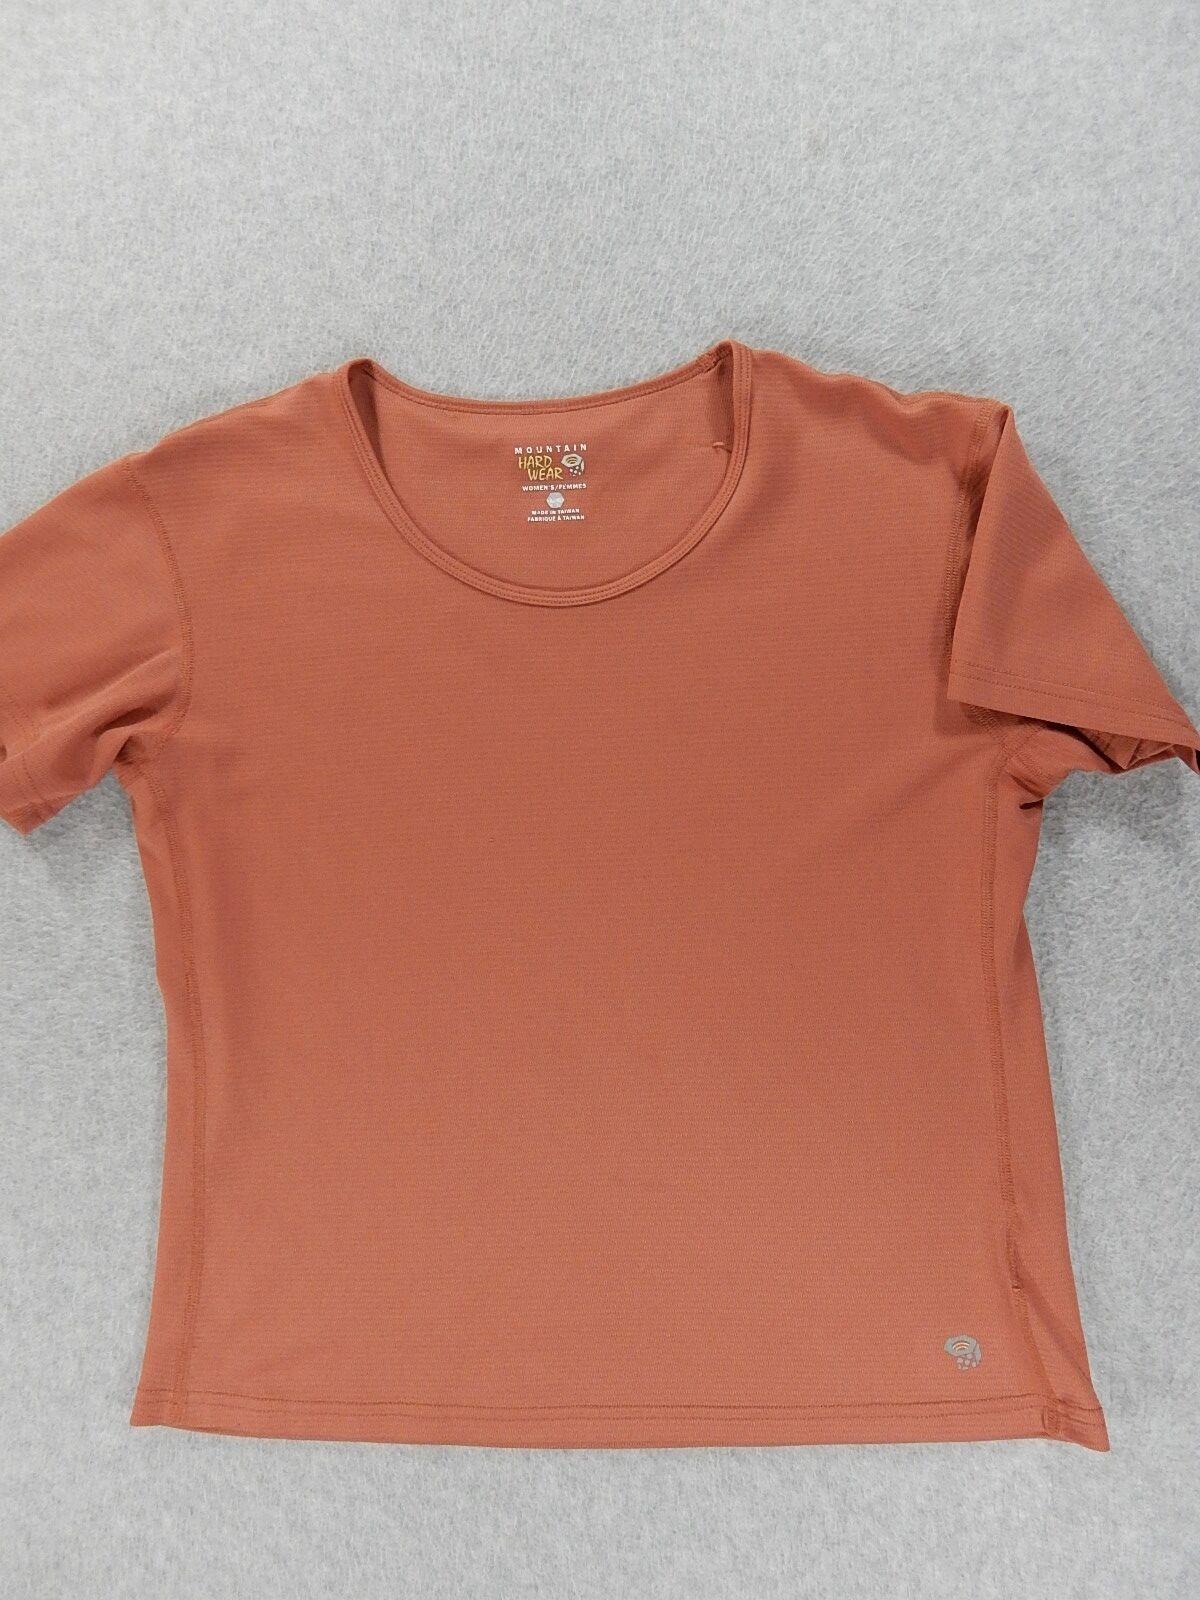 Mountain Hardwear Wicked Short Sleeve Shirt (Womens Large)